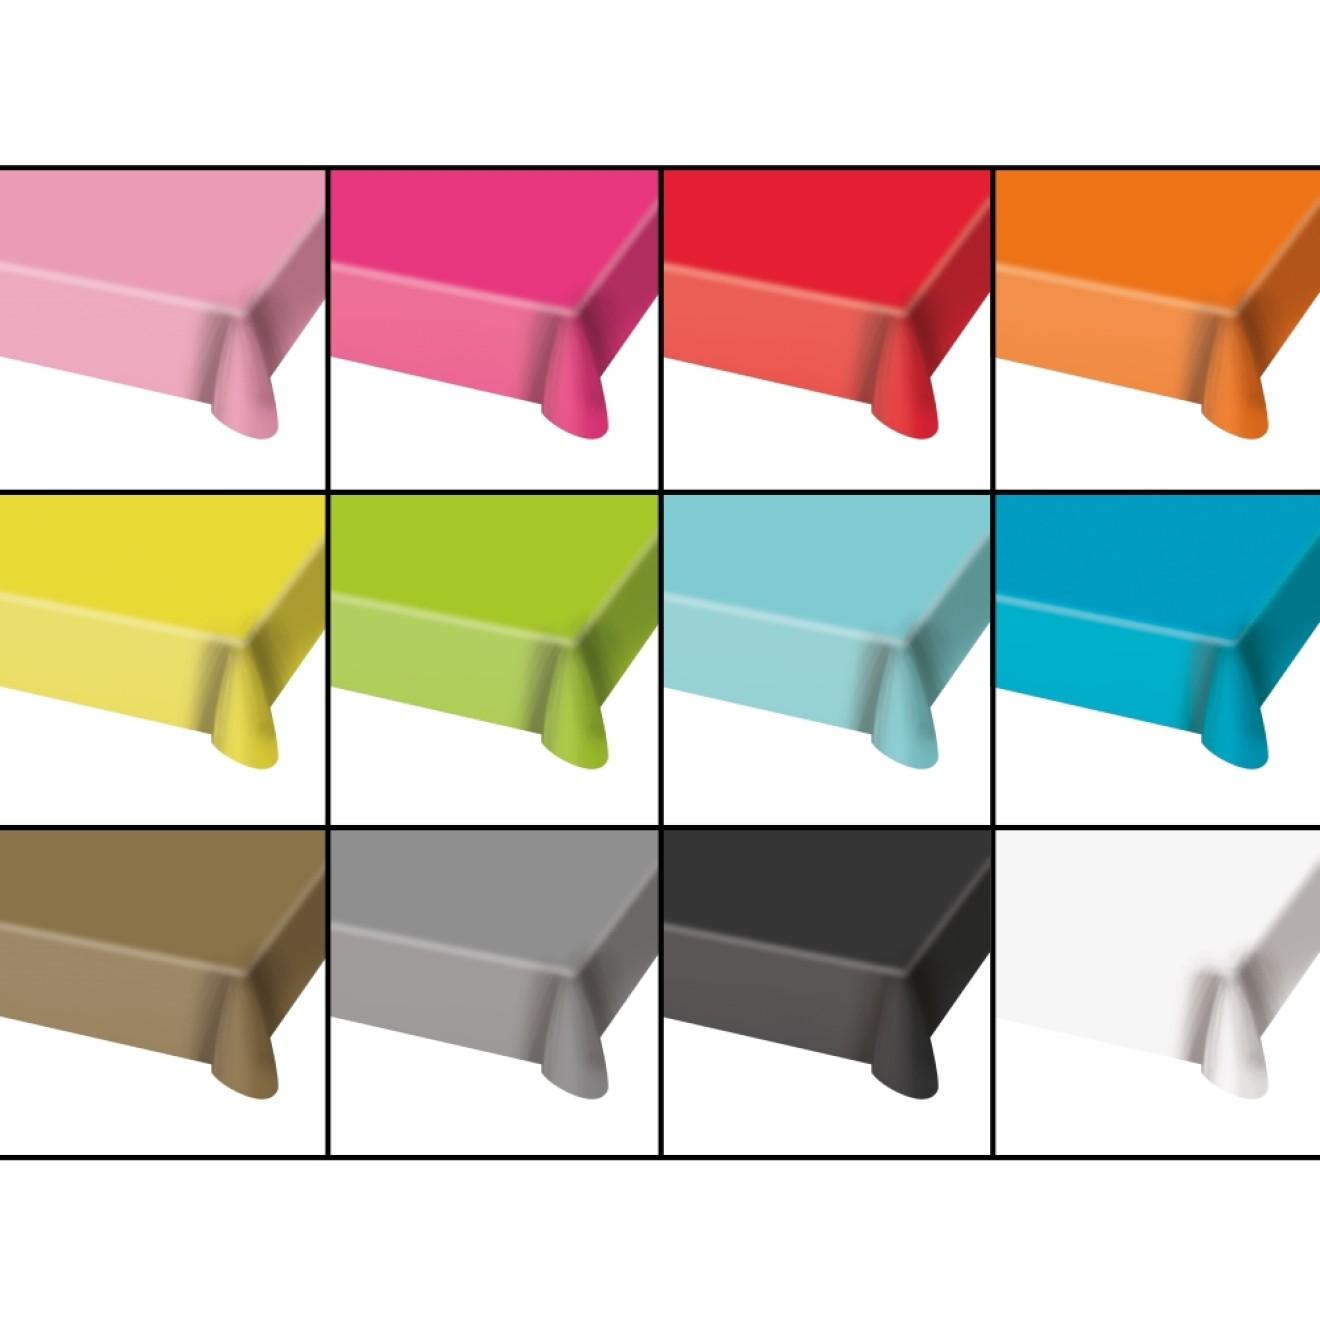 tischdecke freie farbwahl 180 cm x 130 cm. Black Bedroom Furniture Sets. Home Design Ideas